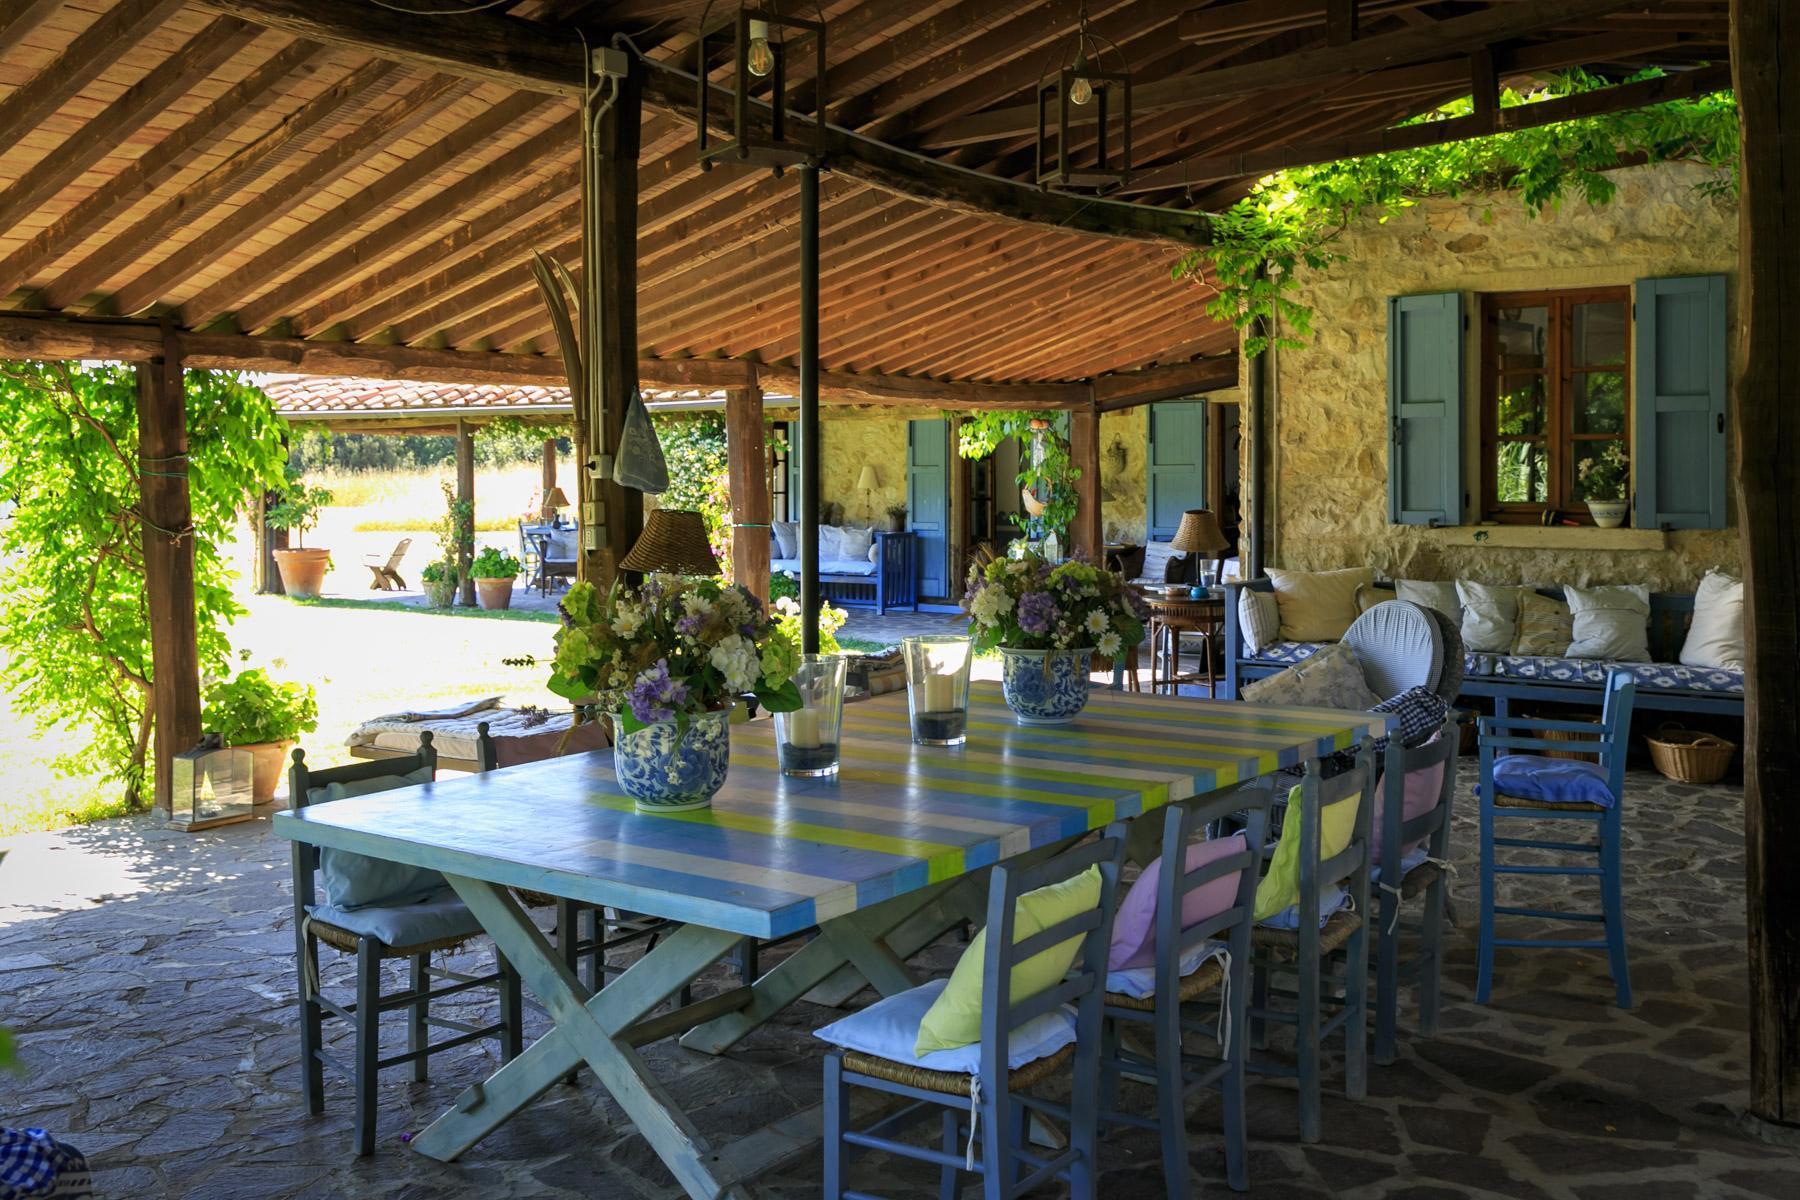 Belle villa toscane avec piscine - 7